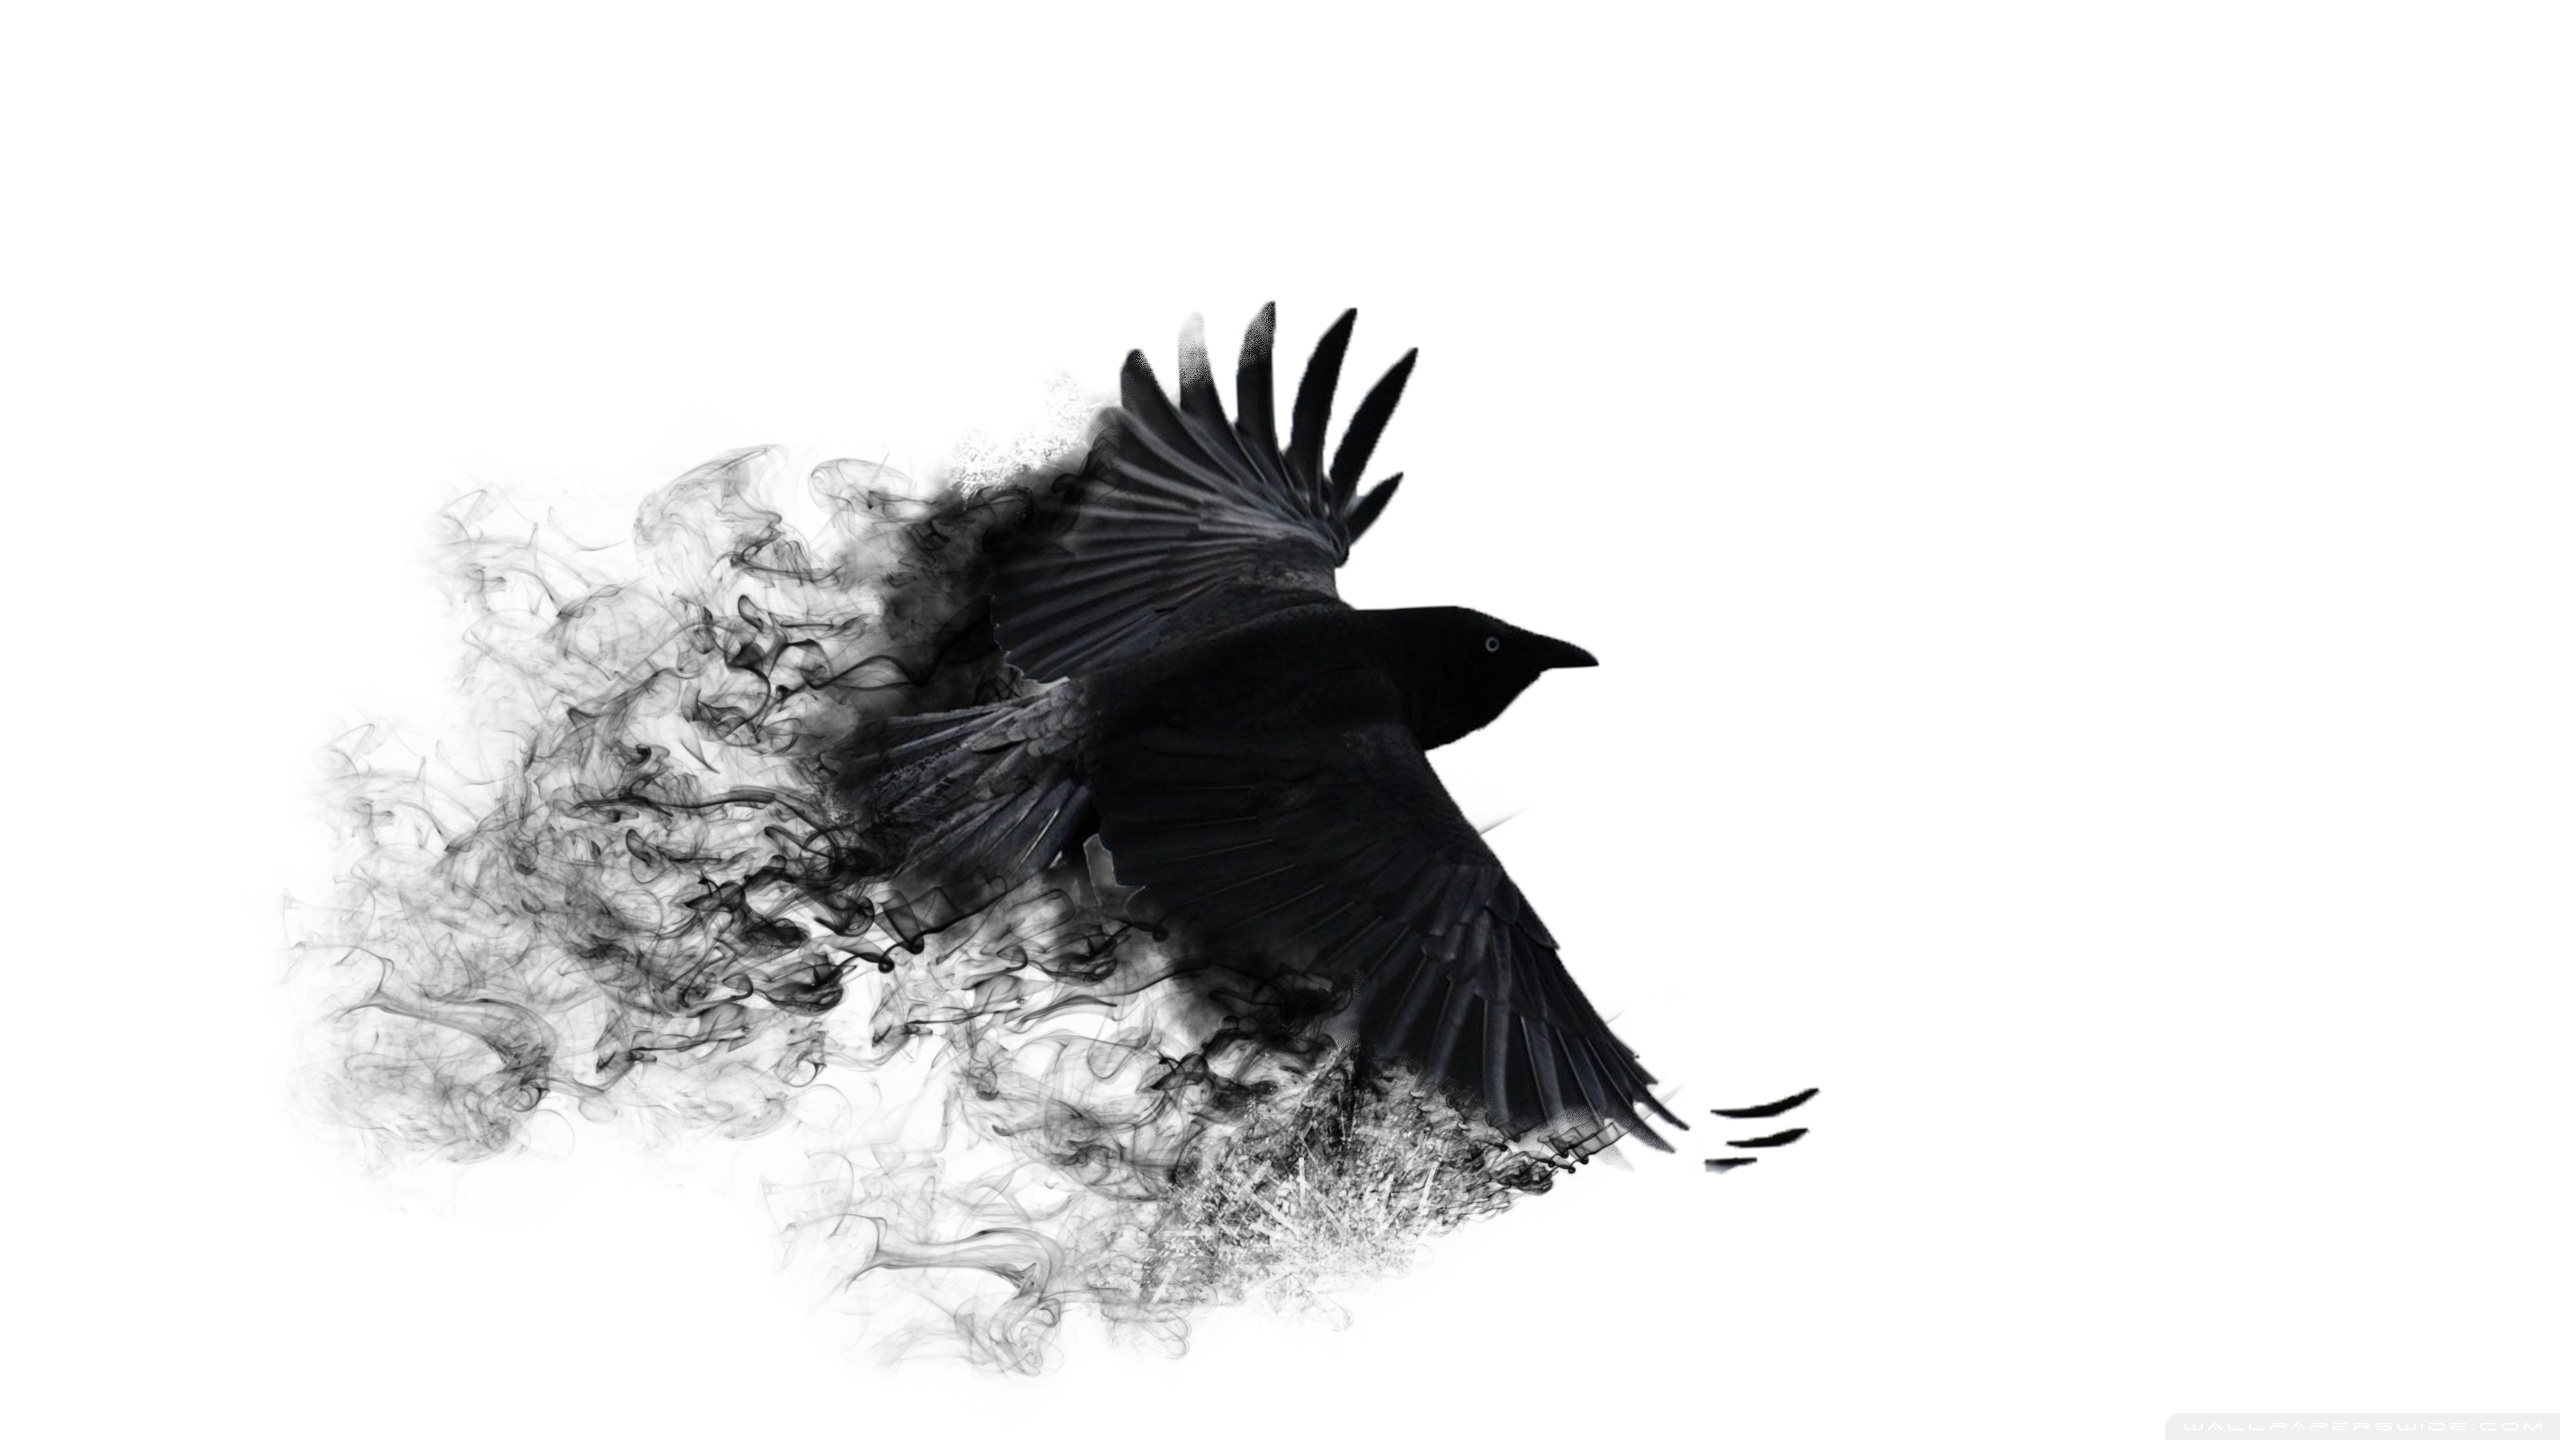 Crow HD PNG - 118747